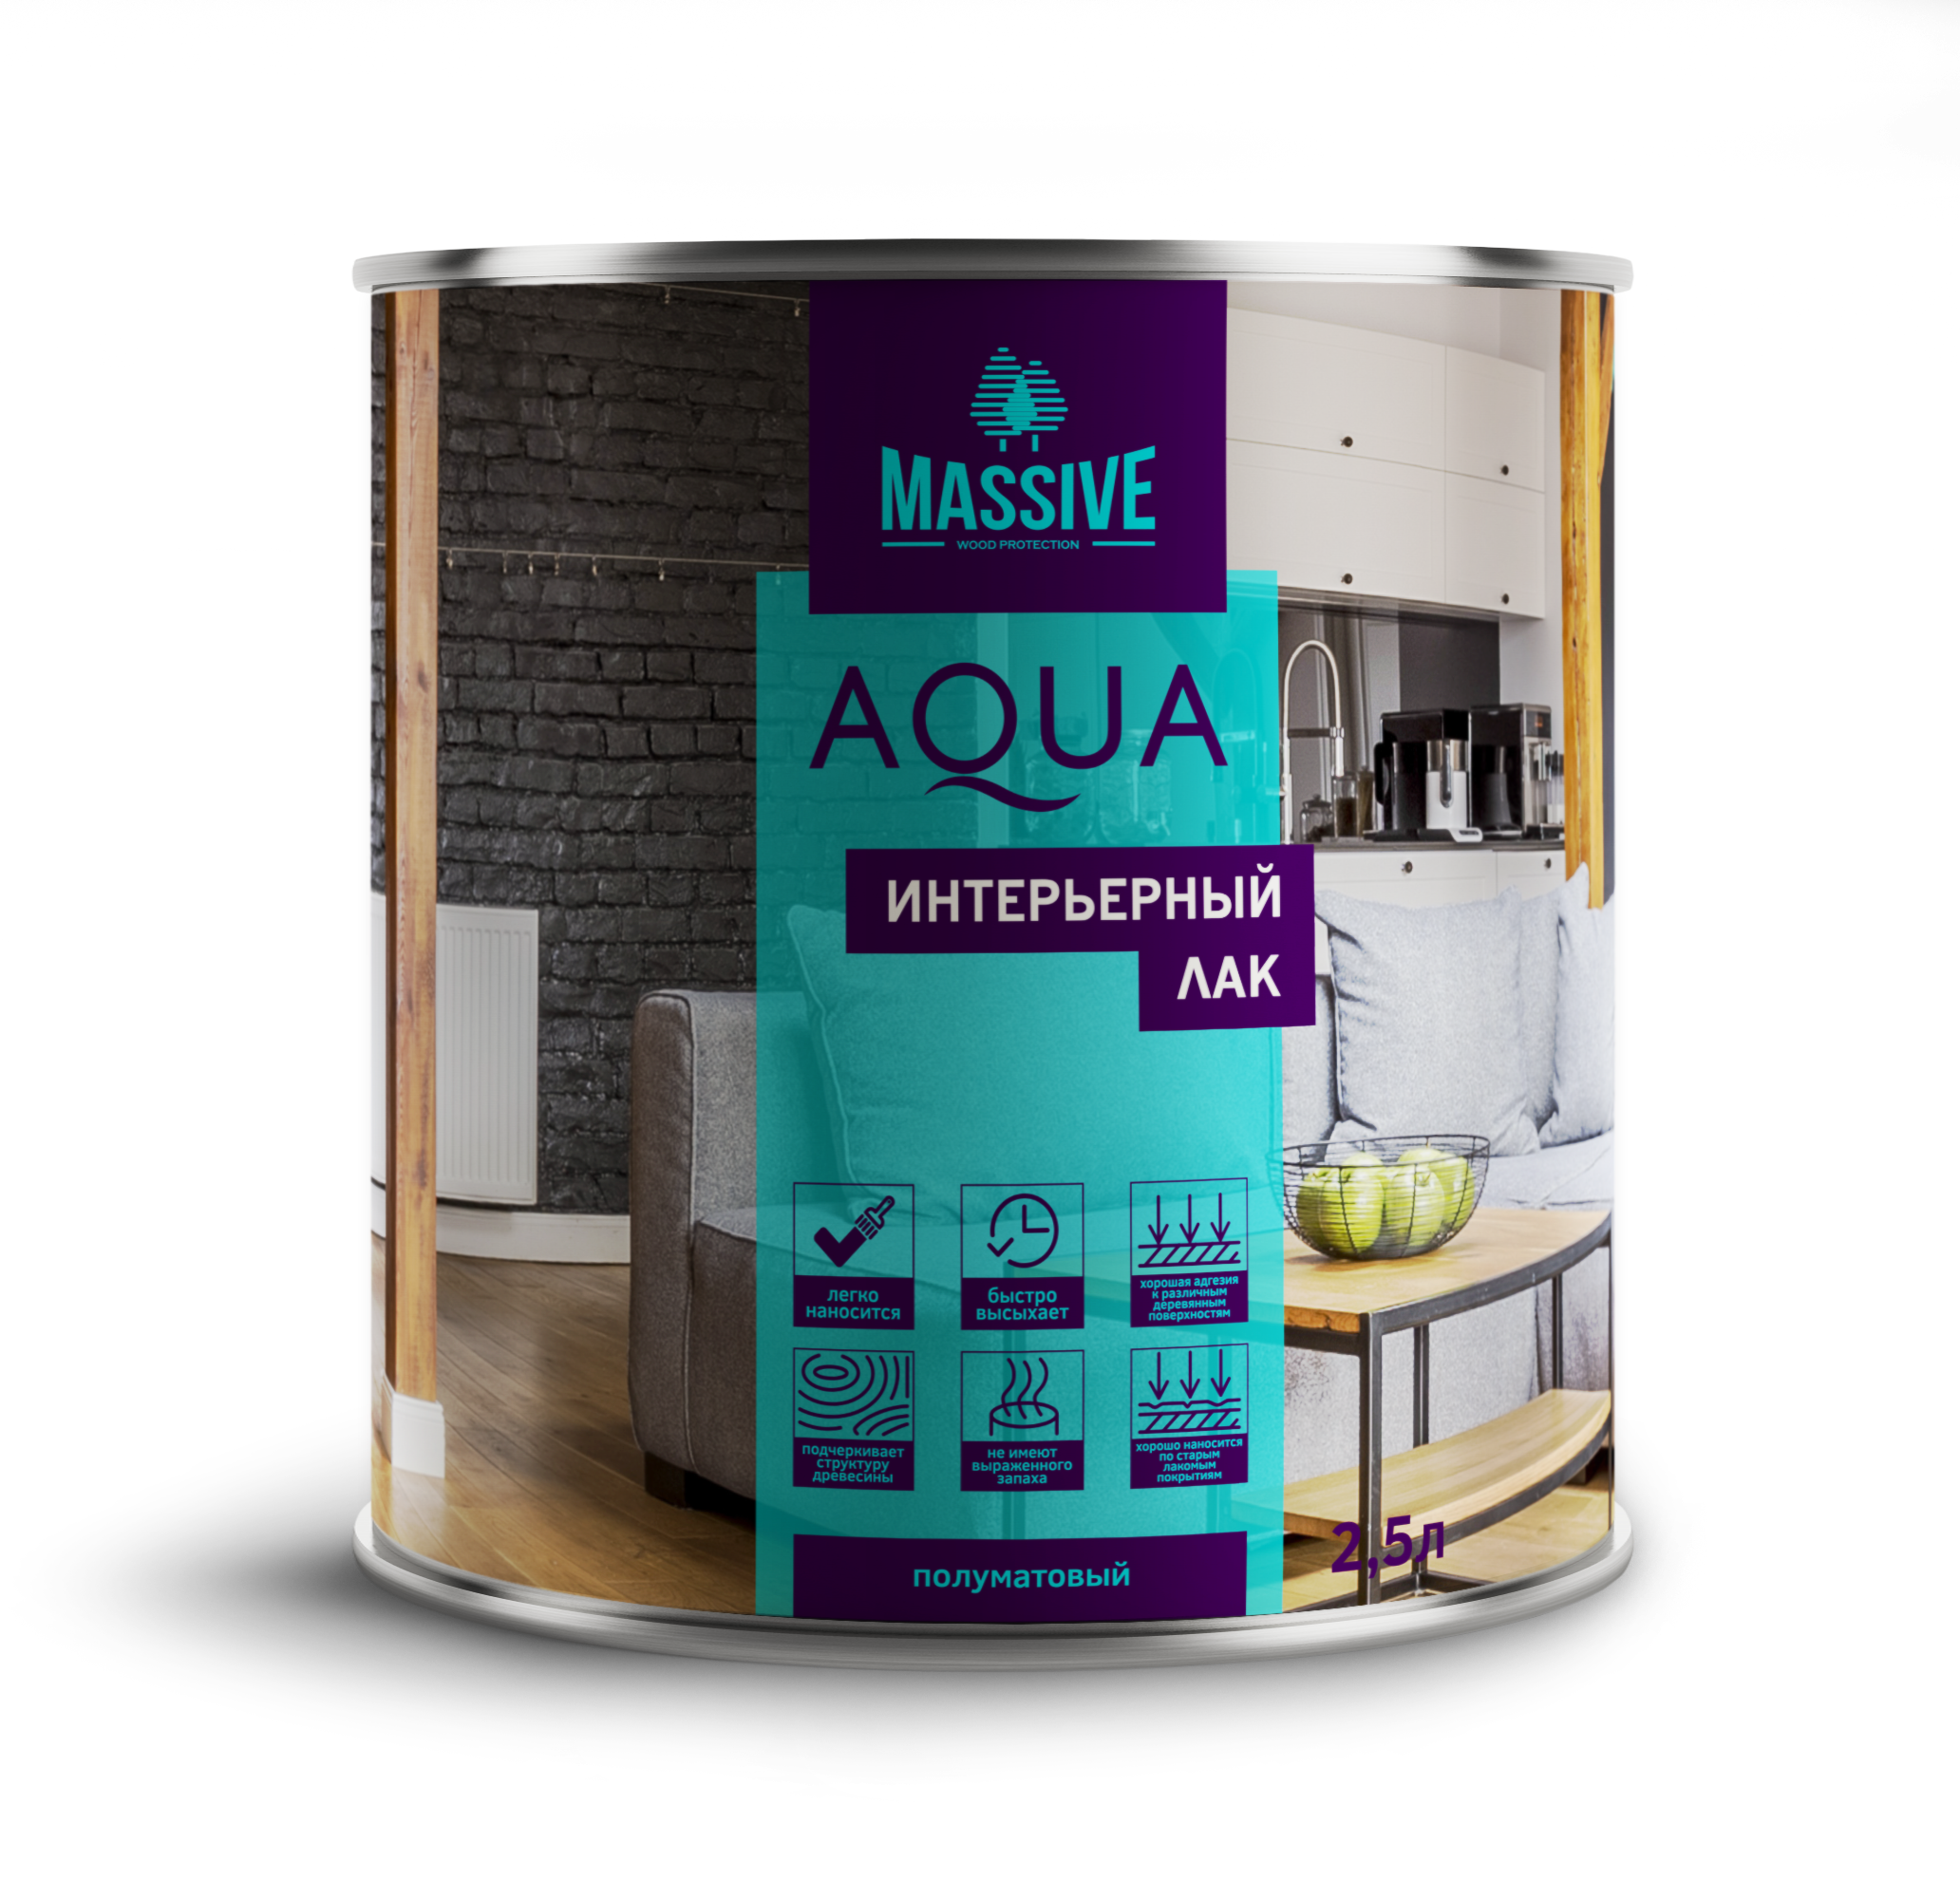 Massive Лак интерьерный Aqua